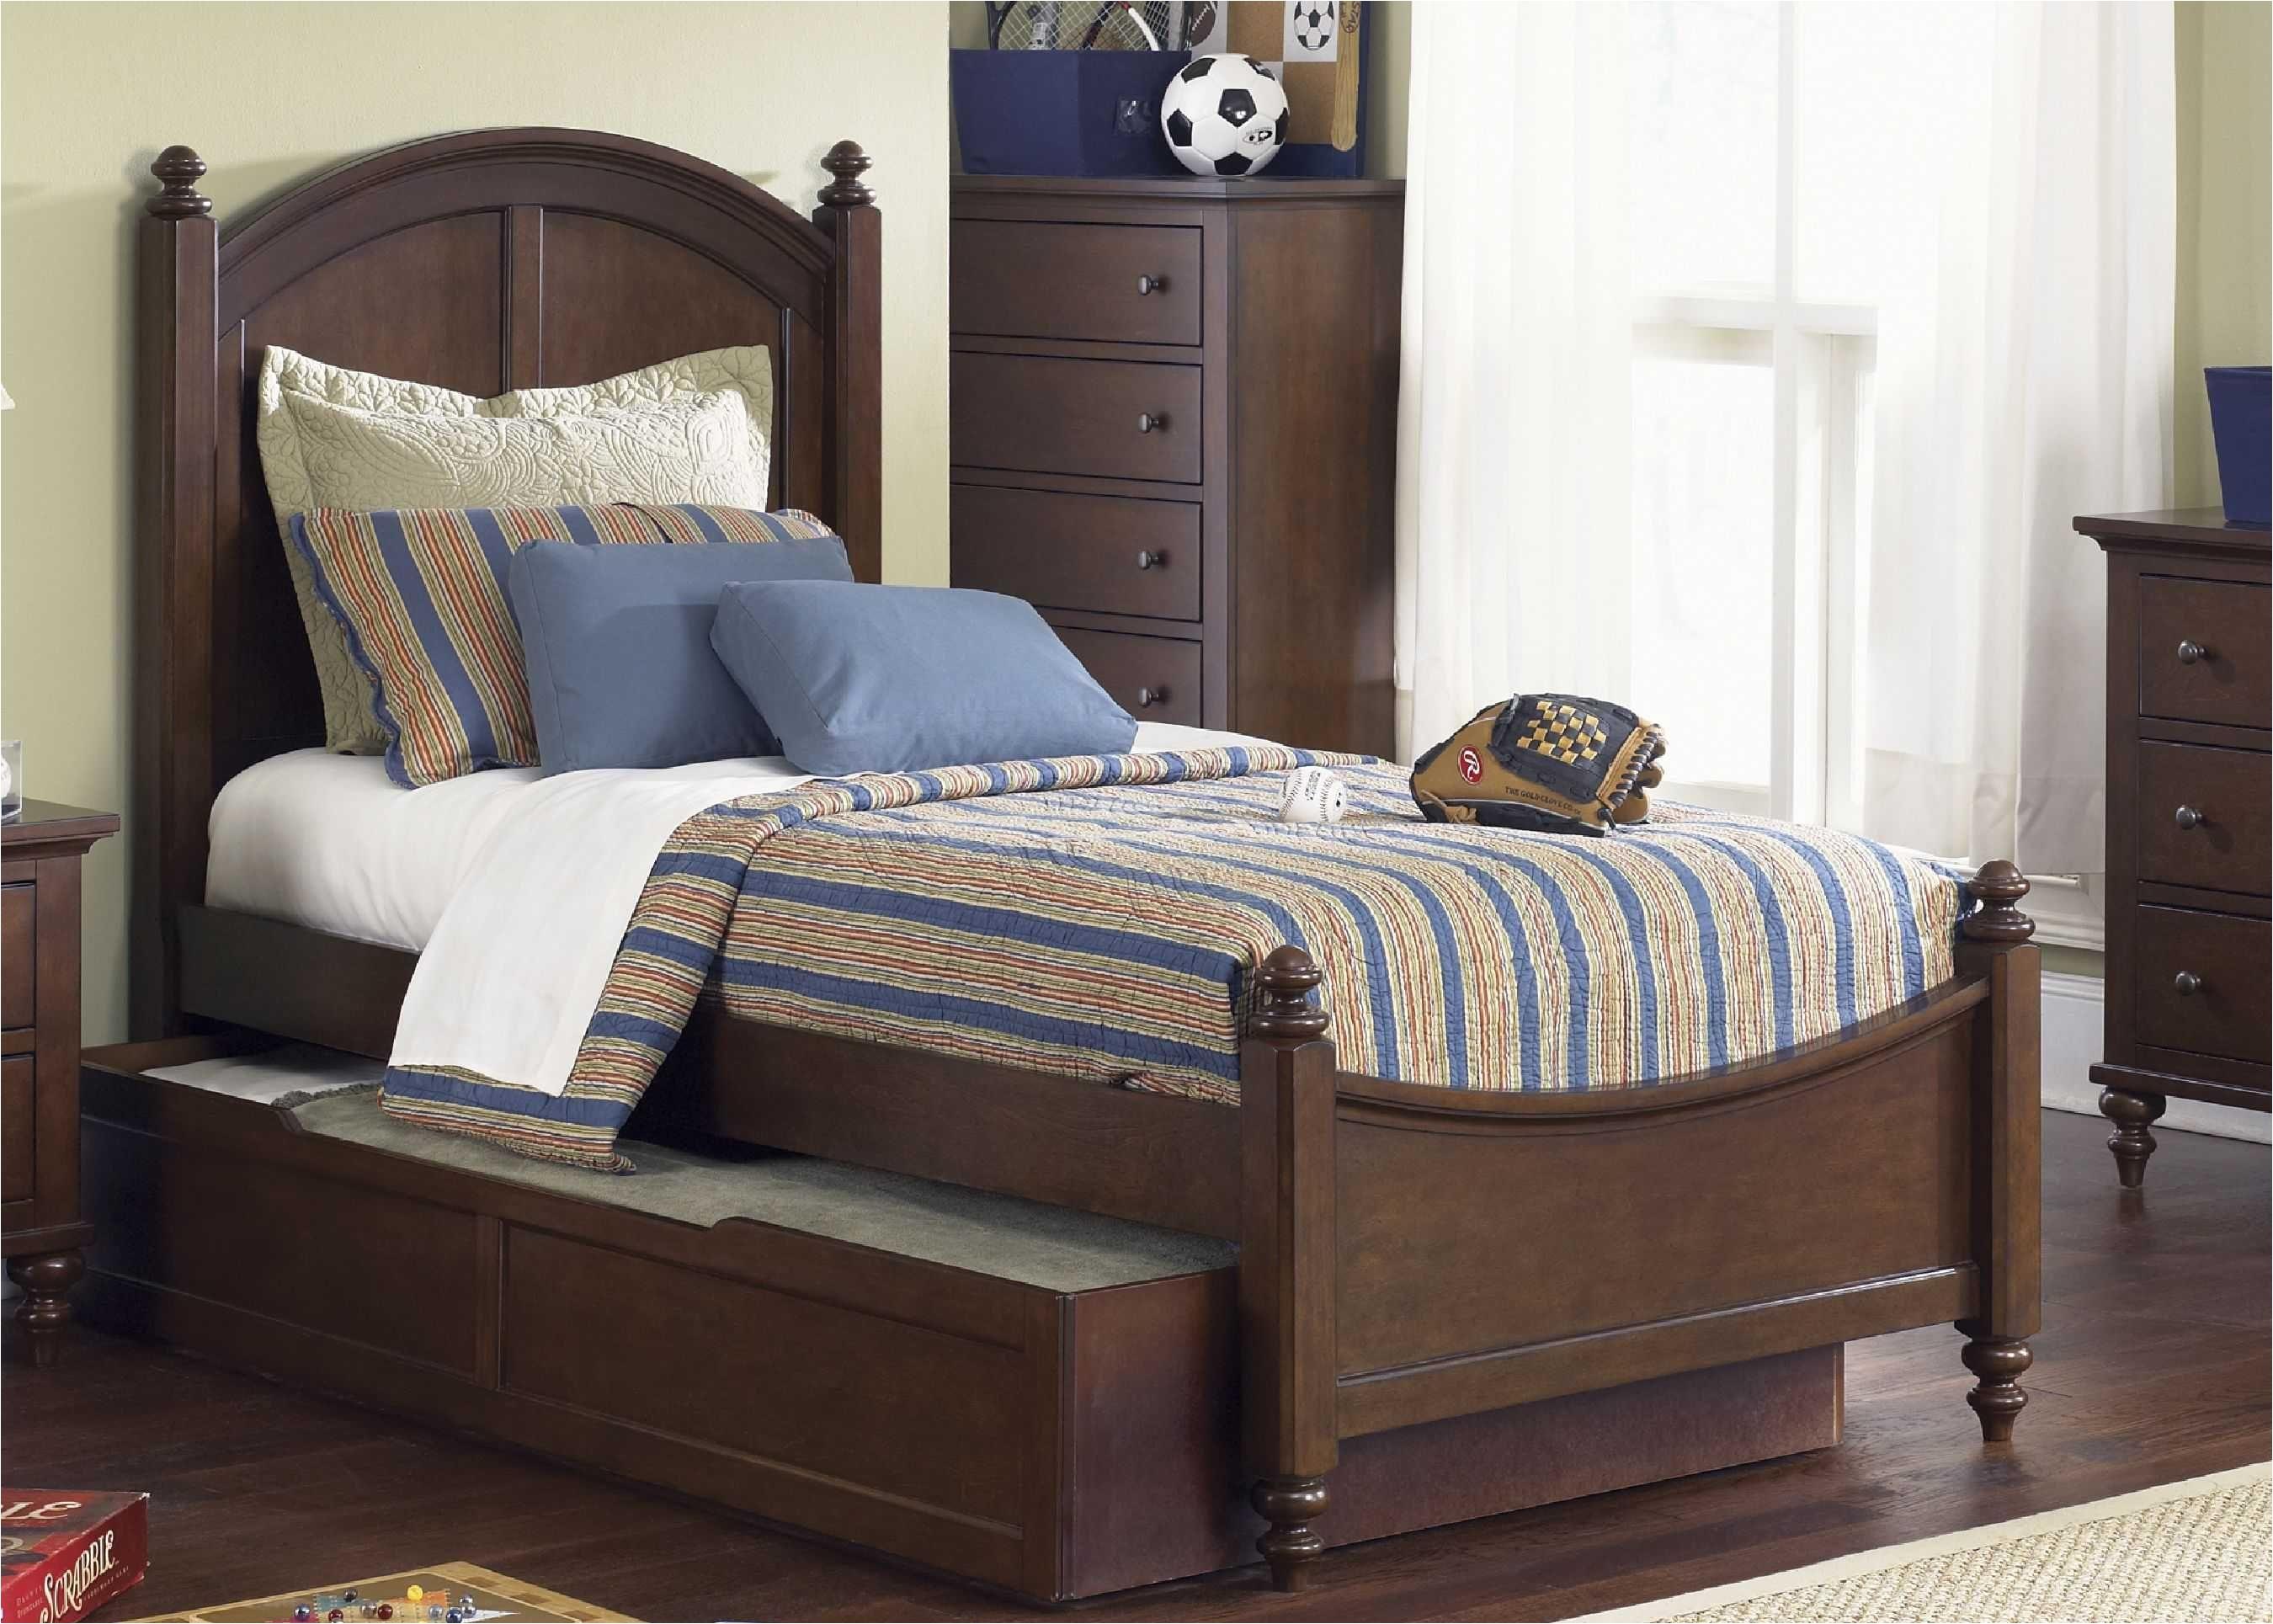 Macy S Girl Bedroom Sets Macys Bedroom Furniture Home Decorating Ideas Pinterest Macys